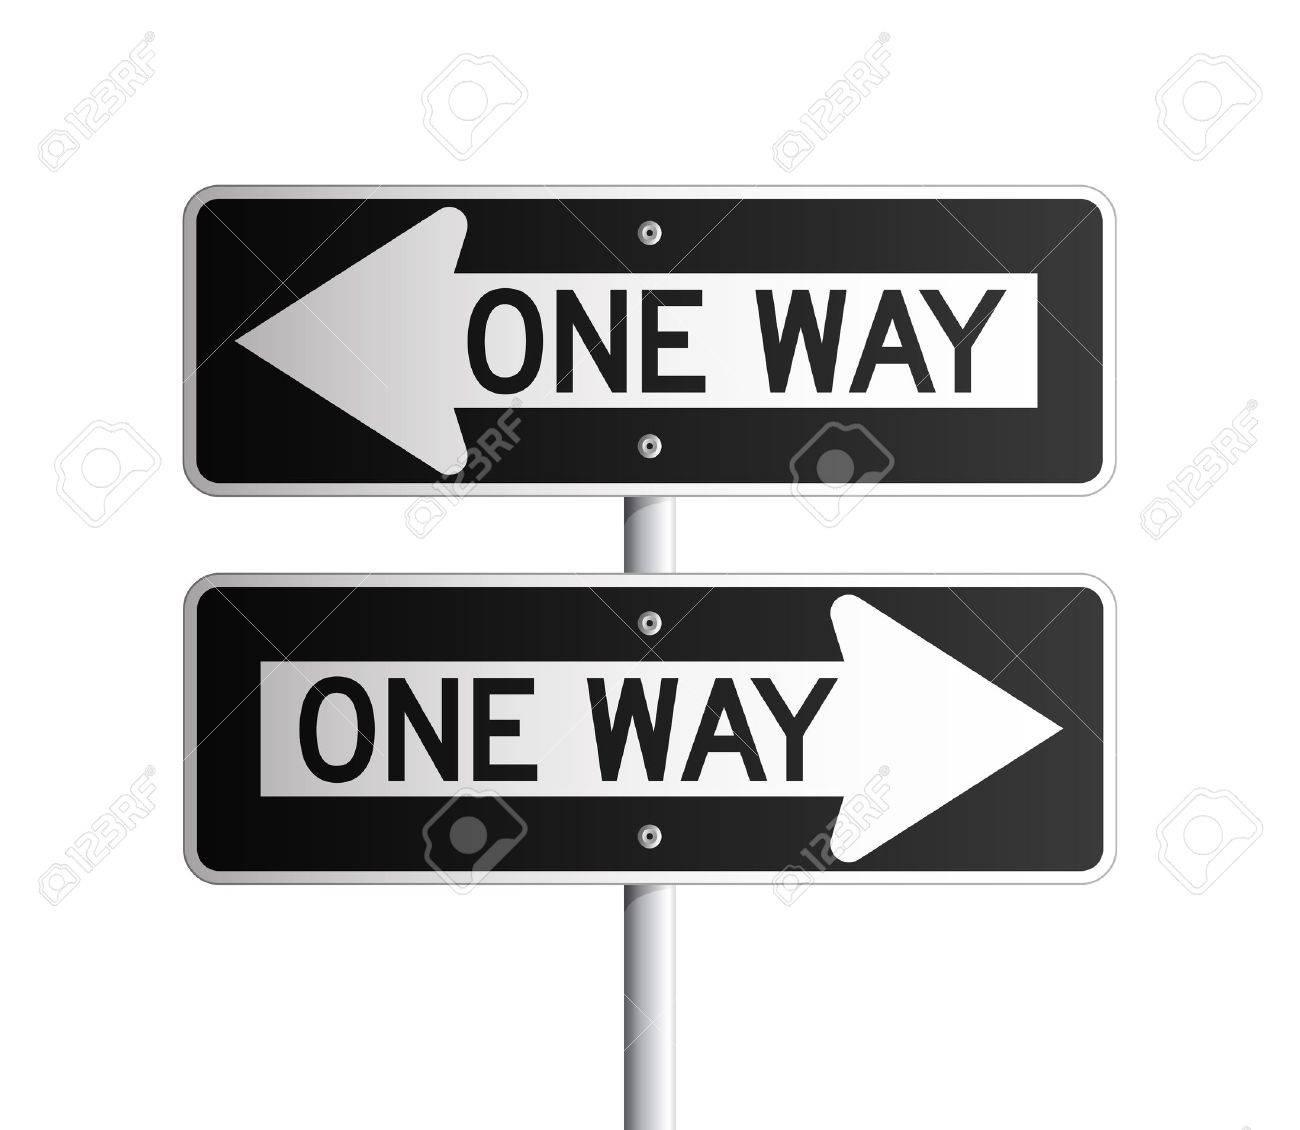 One way board 2 - 11295299